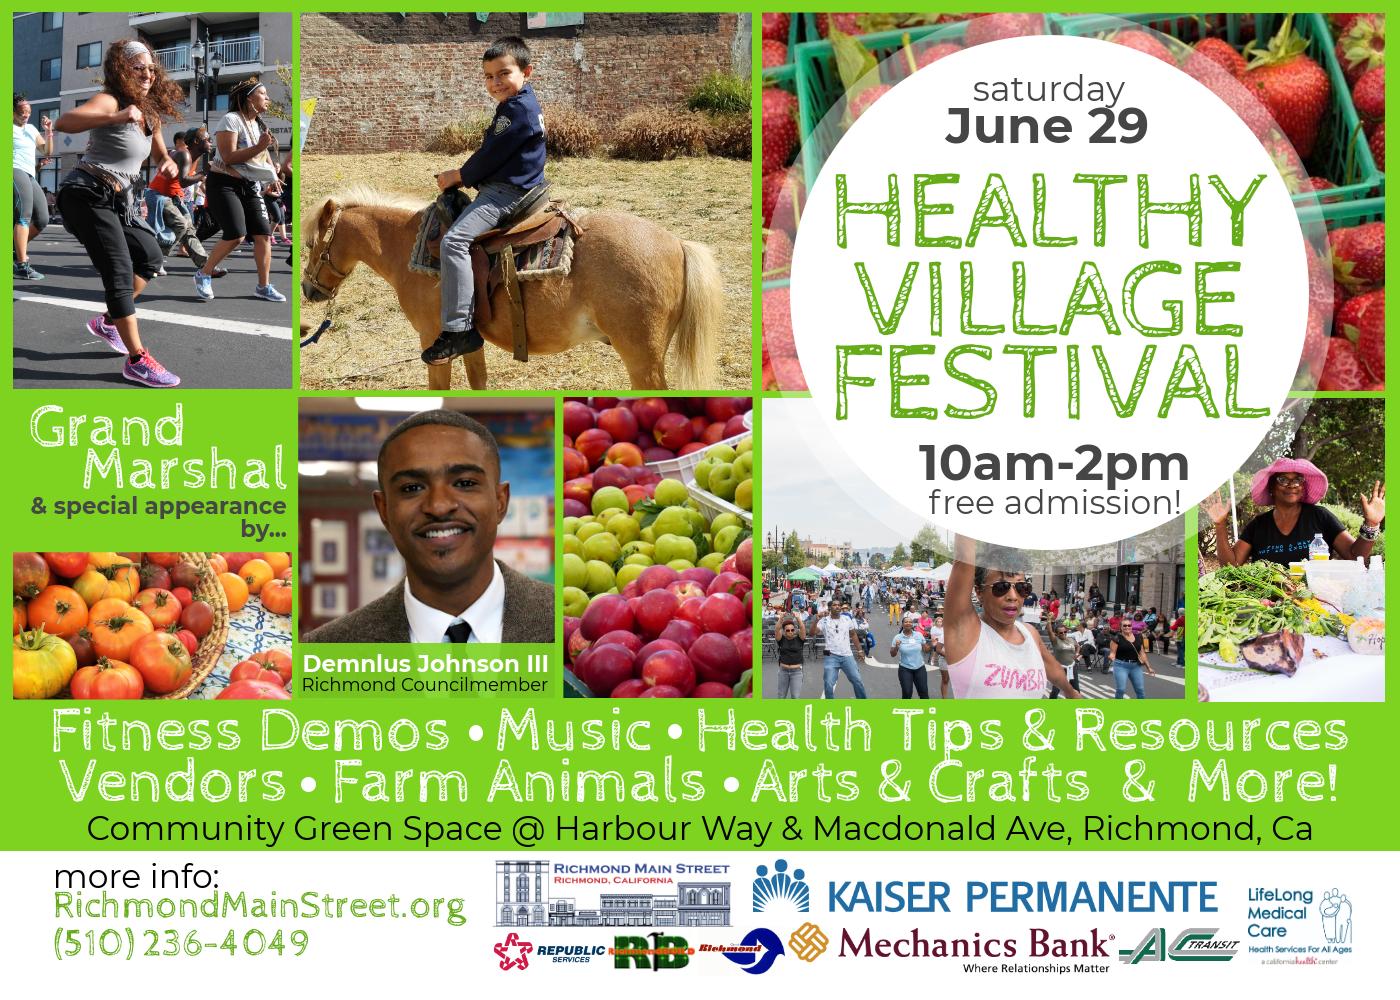 Postcard for Healthy Village Festival on 6/29/2019